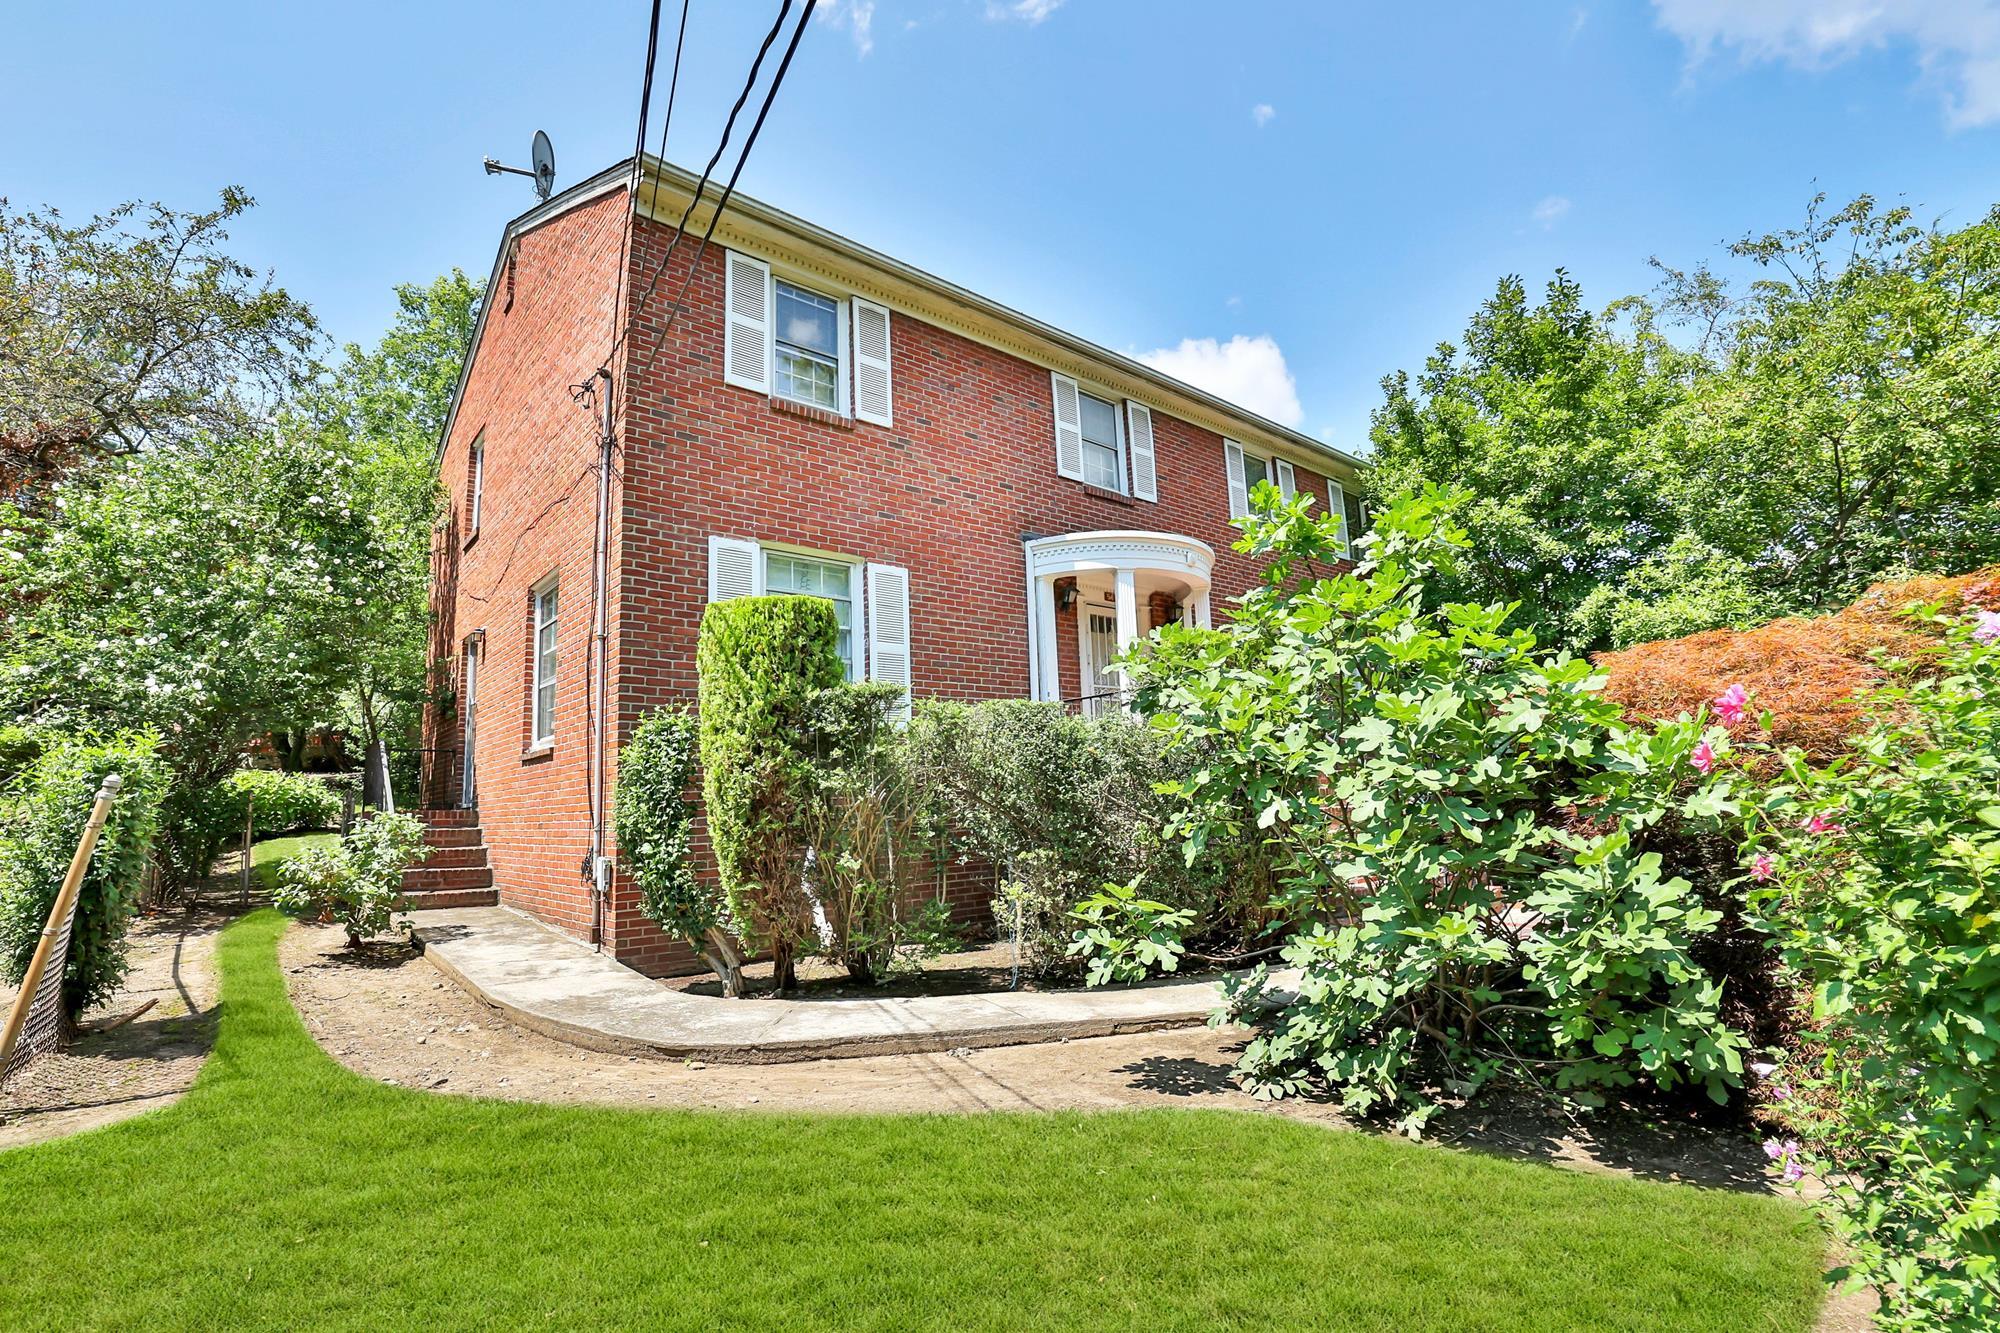 Spacious 4-Bd. Brick House w/ Patio & Level, Grassy Yard